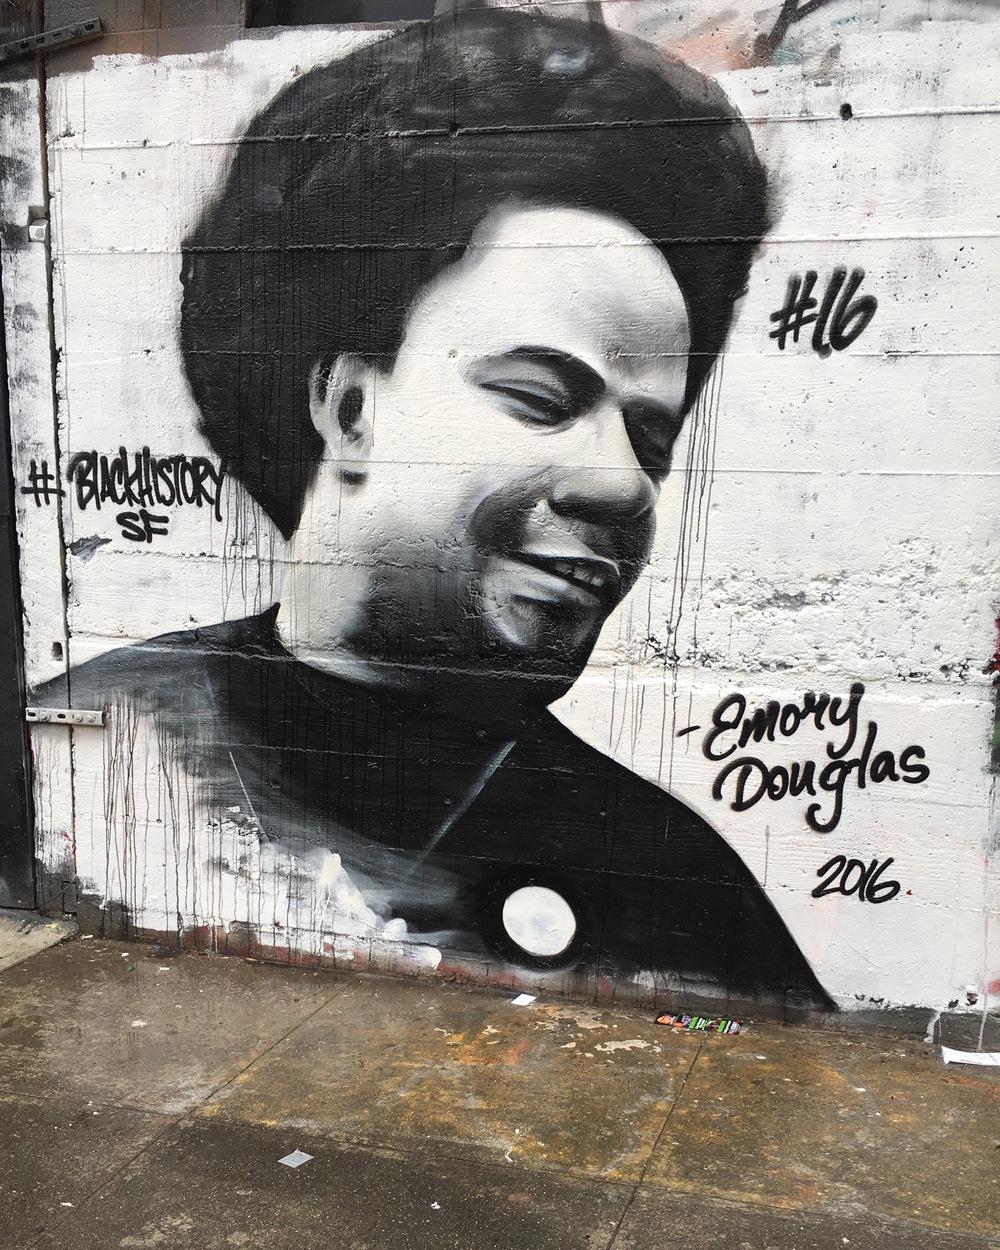 No. 16: Emory Douglas